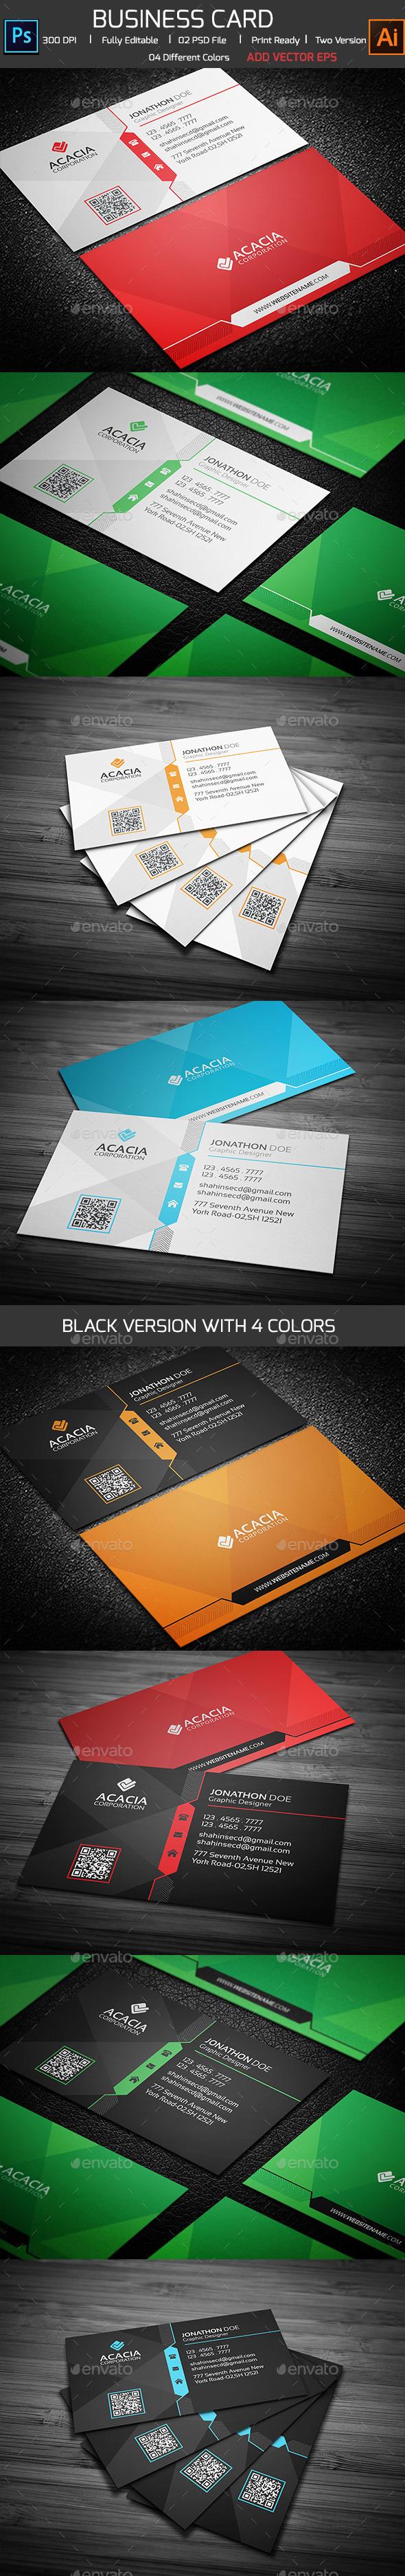 Corporate Business Card V-01 - Corporate Business Cards